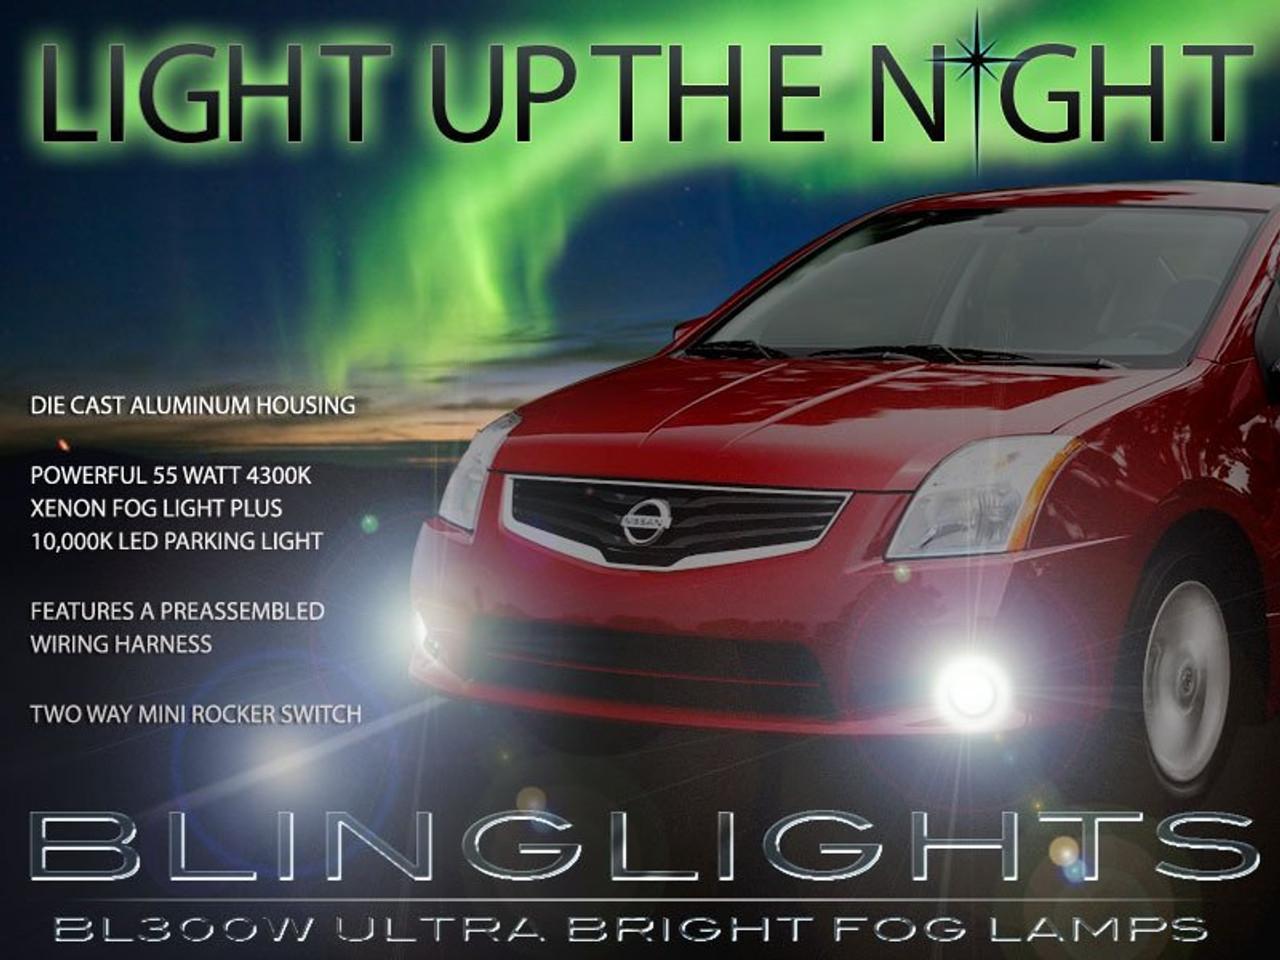 small resolution of 2007 2008 2009 2010 2011 2012 nissan sentra xenon led fog lamps driving lights foglamps kit blinglights com